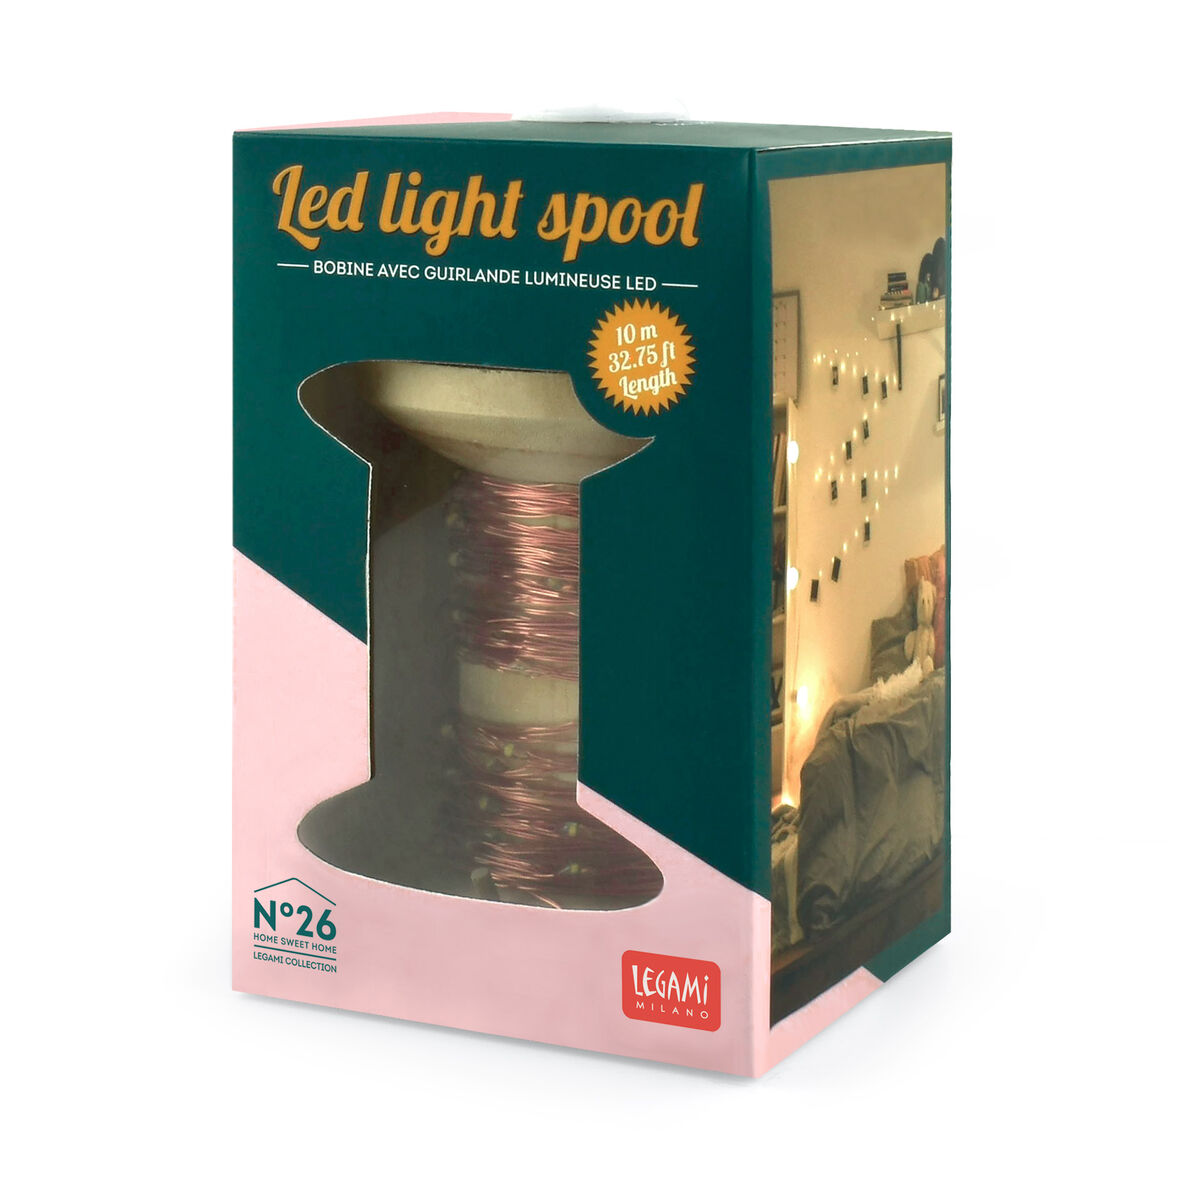 Sparkling Nights - Led Light Spool, , zoom